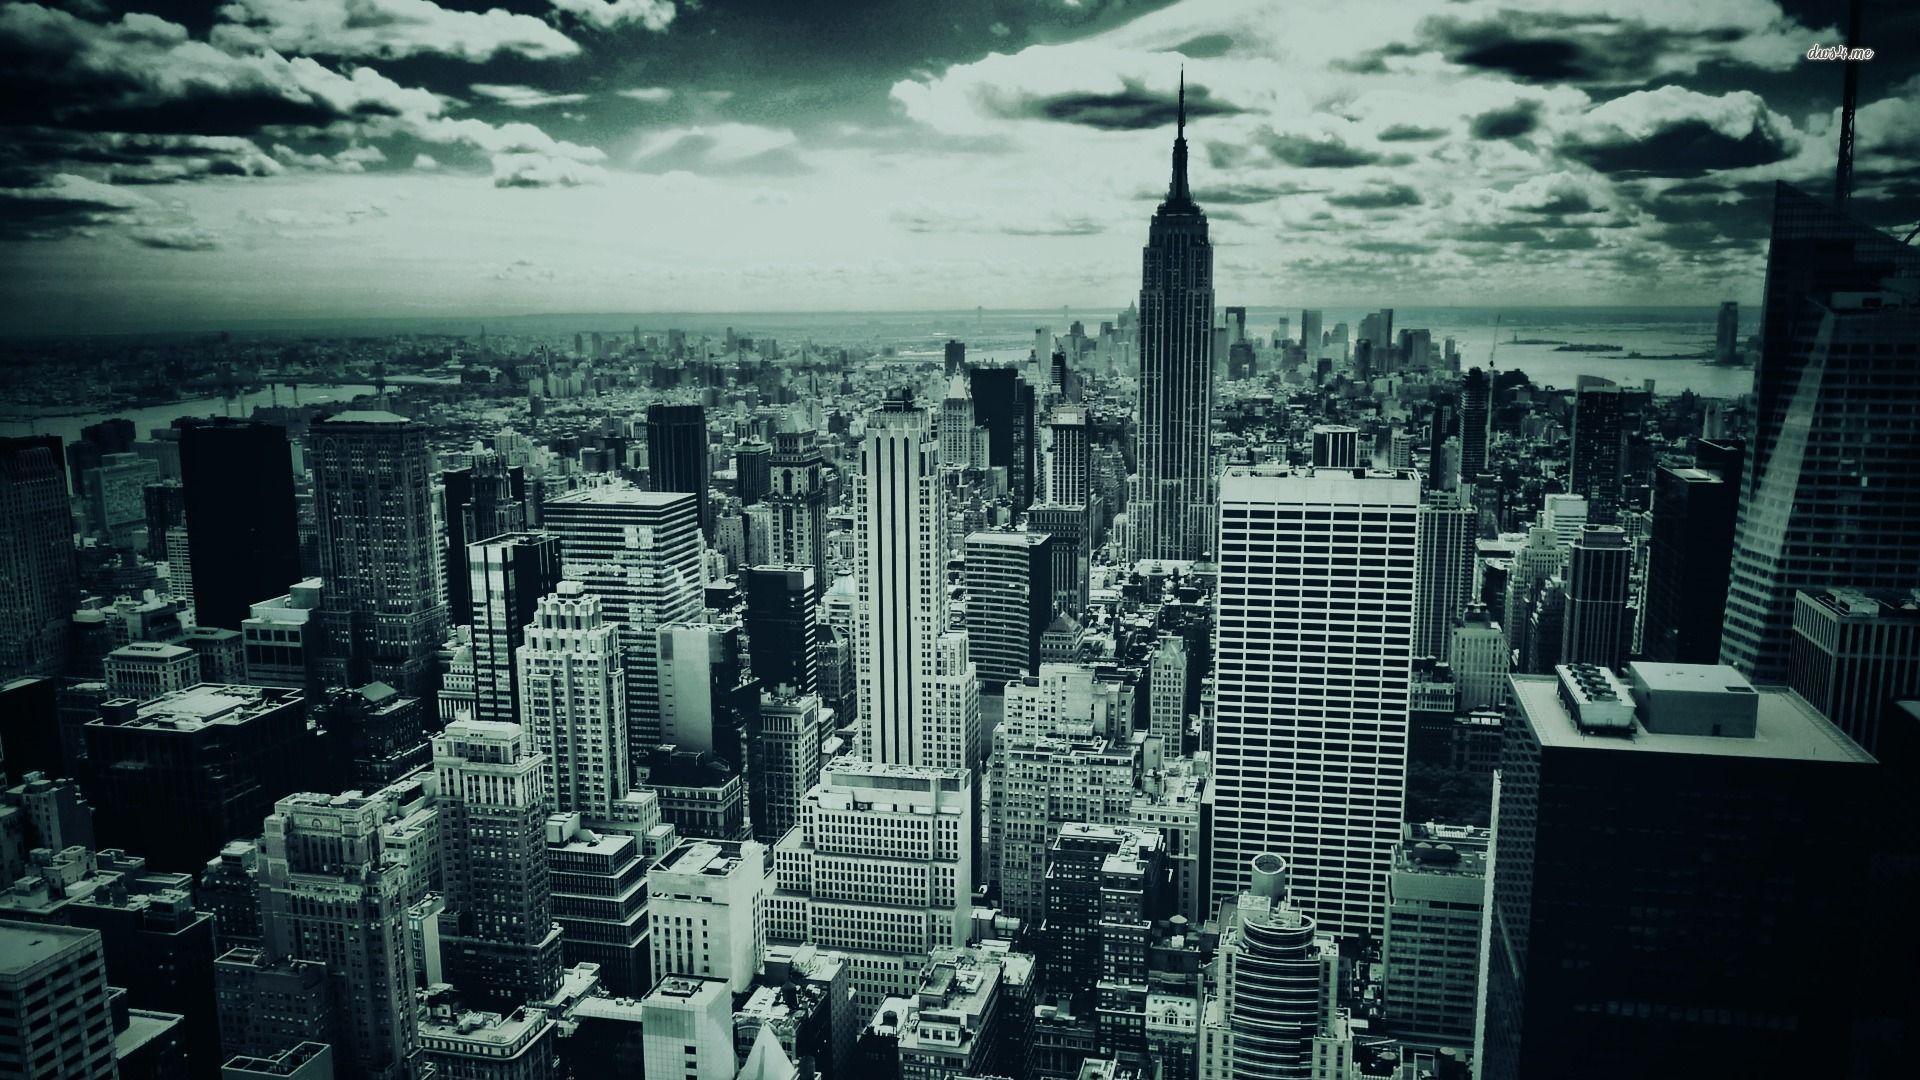 New York City Desktop Wallpapers Top Free New York City Desktop